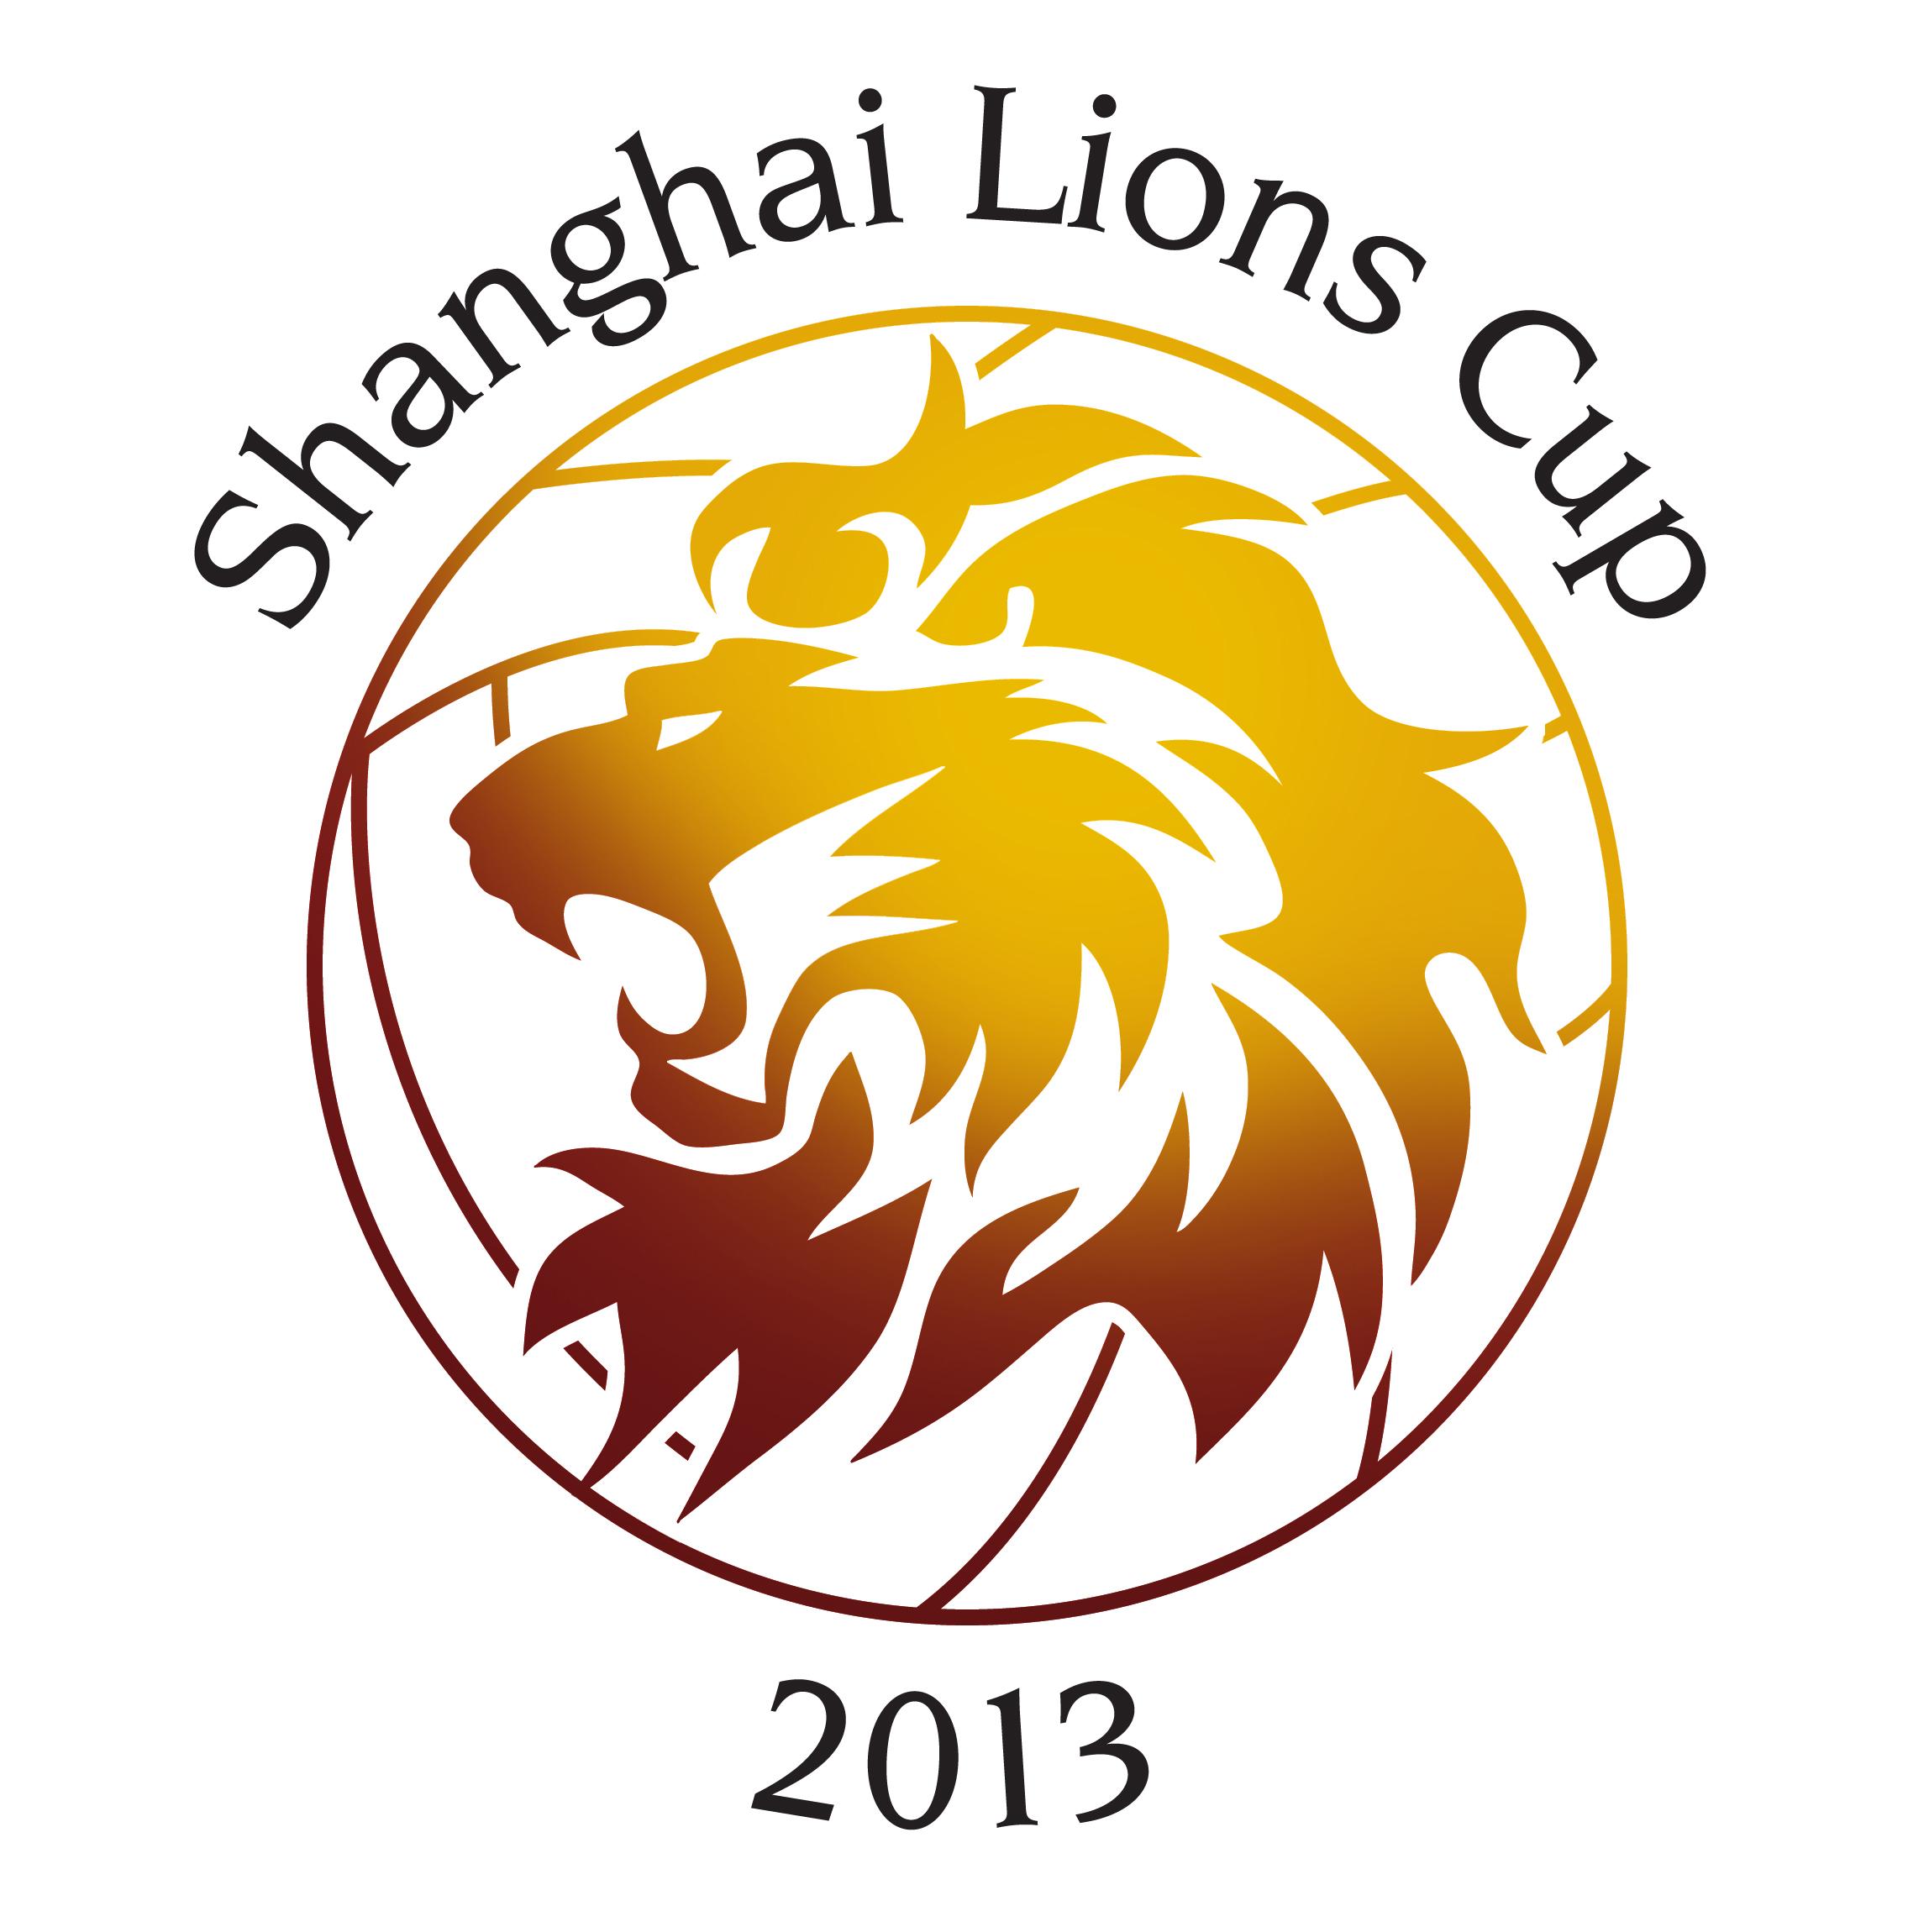 Lions Cup logo 2013